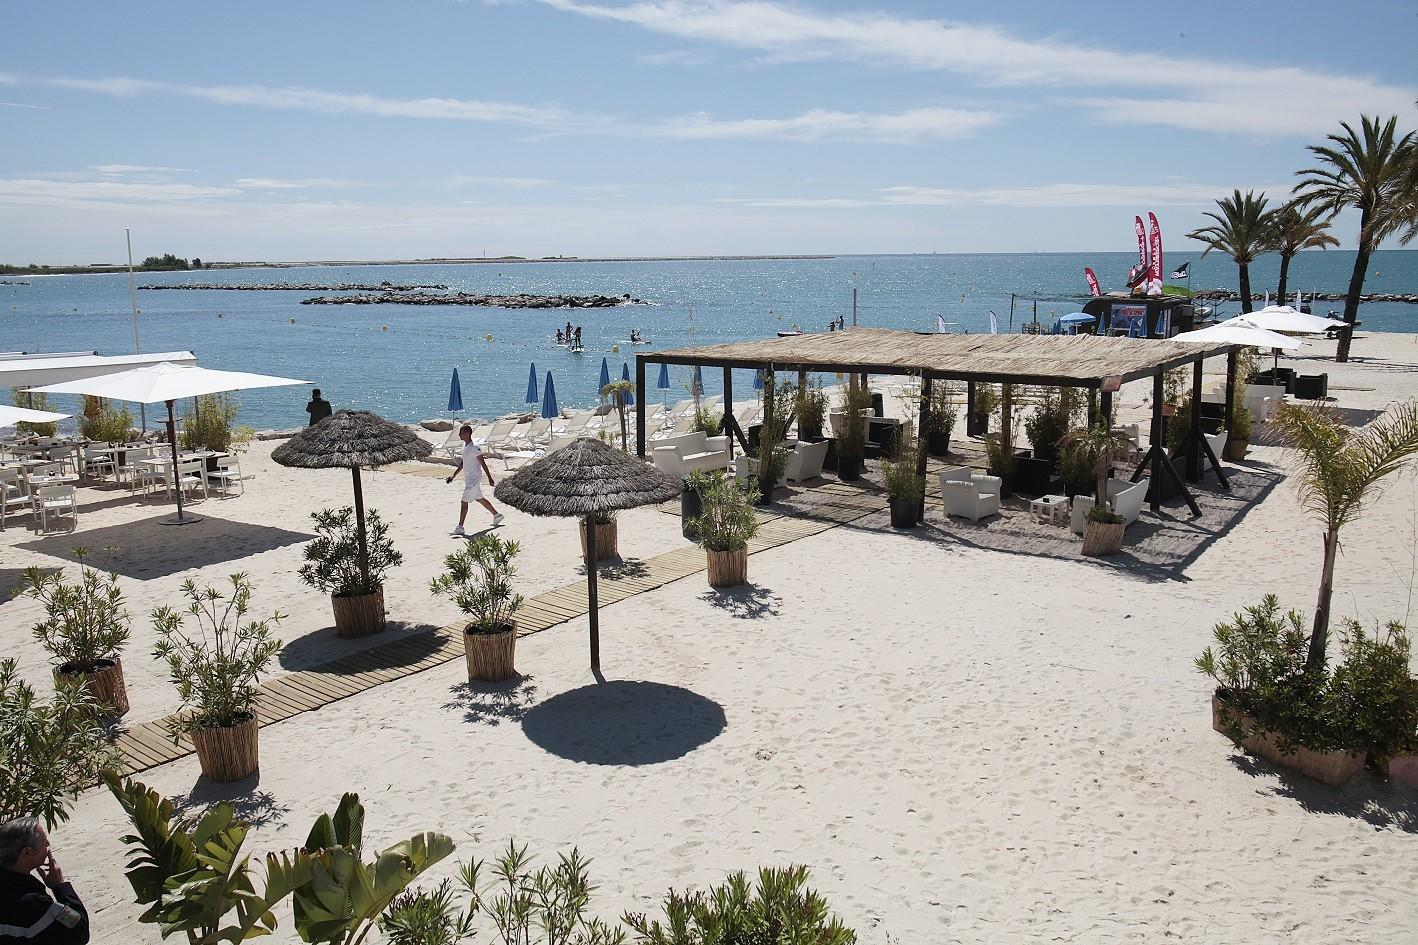 Bay-Star-Beach-holiday-inn-st-laurent-du-var_plage